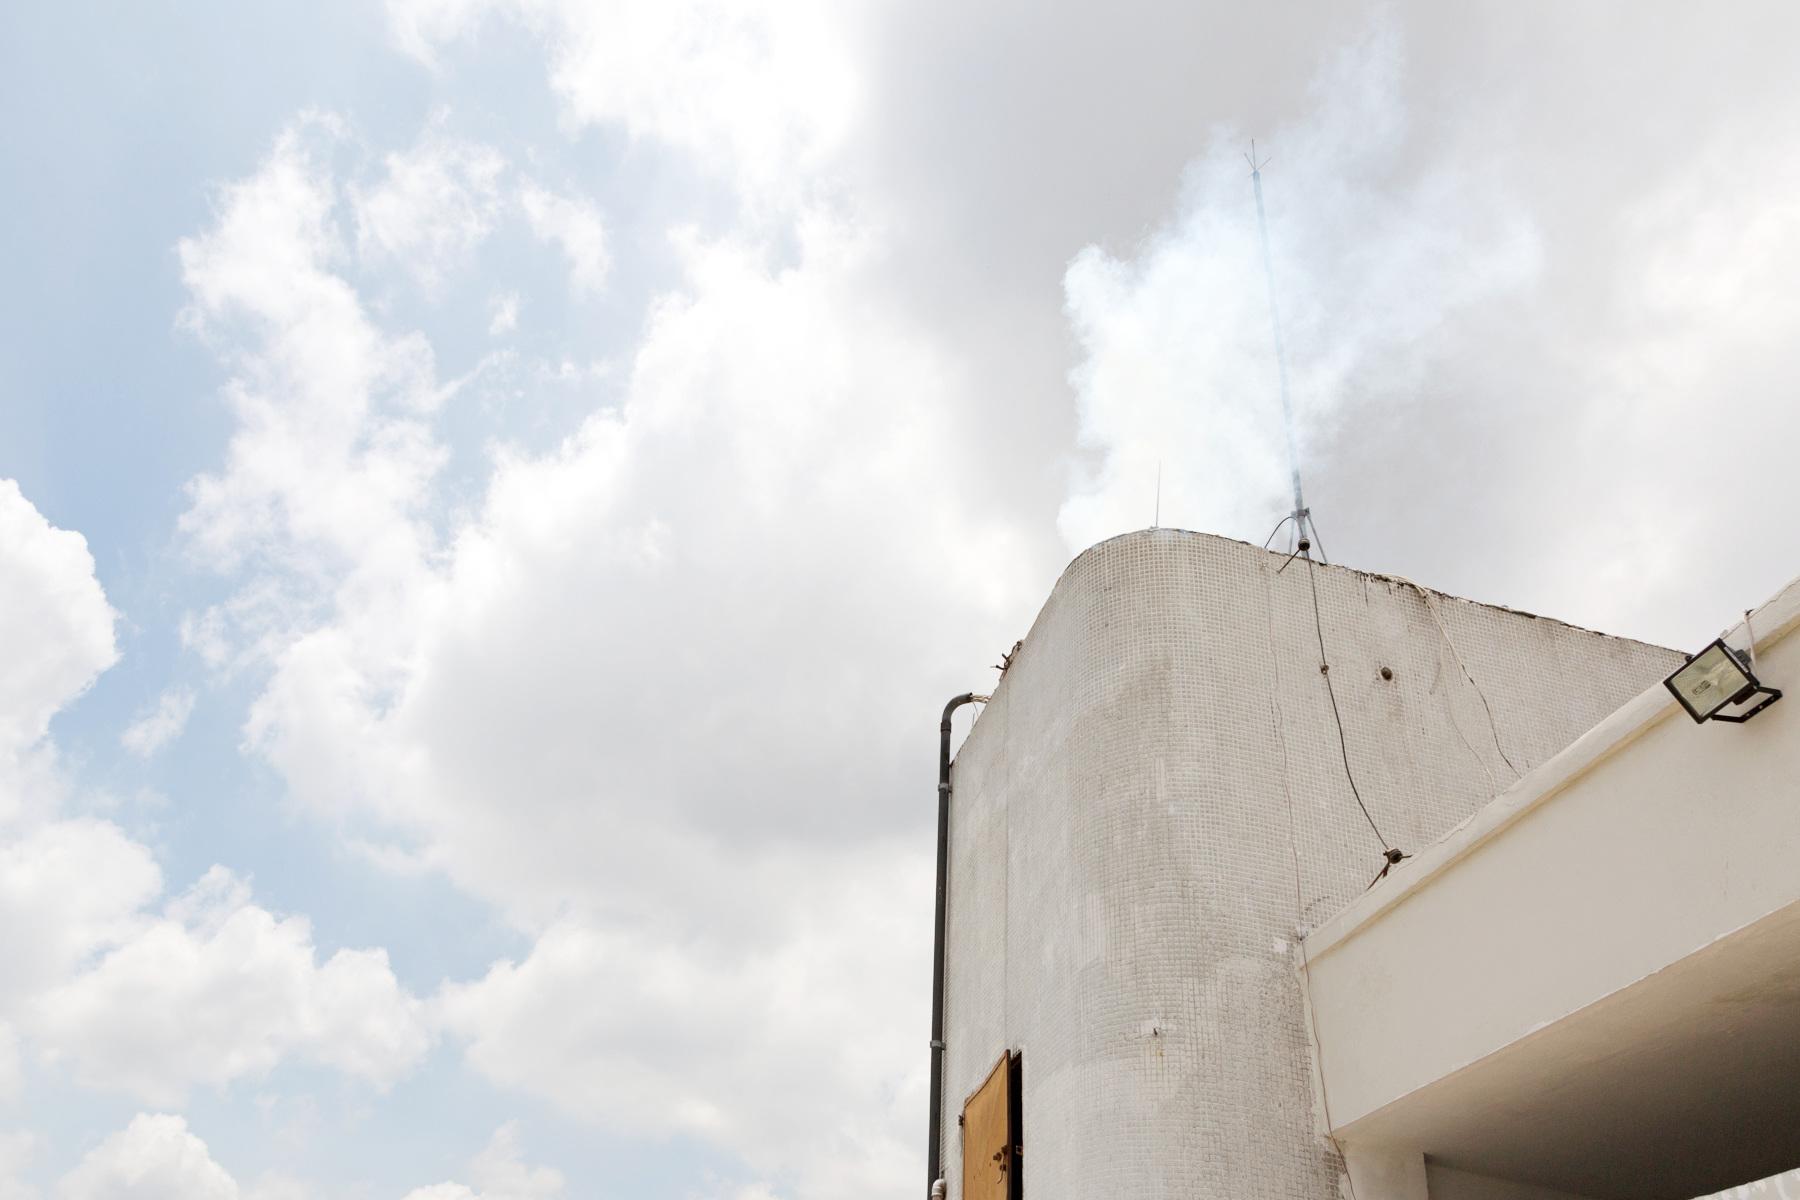 17 Observatório - Hipótese e Horizonte - Fábio Tremonte, Epidemia-fumaça